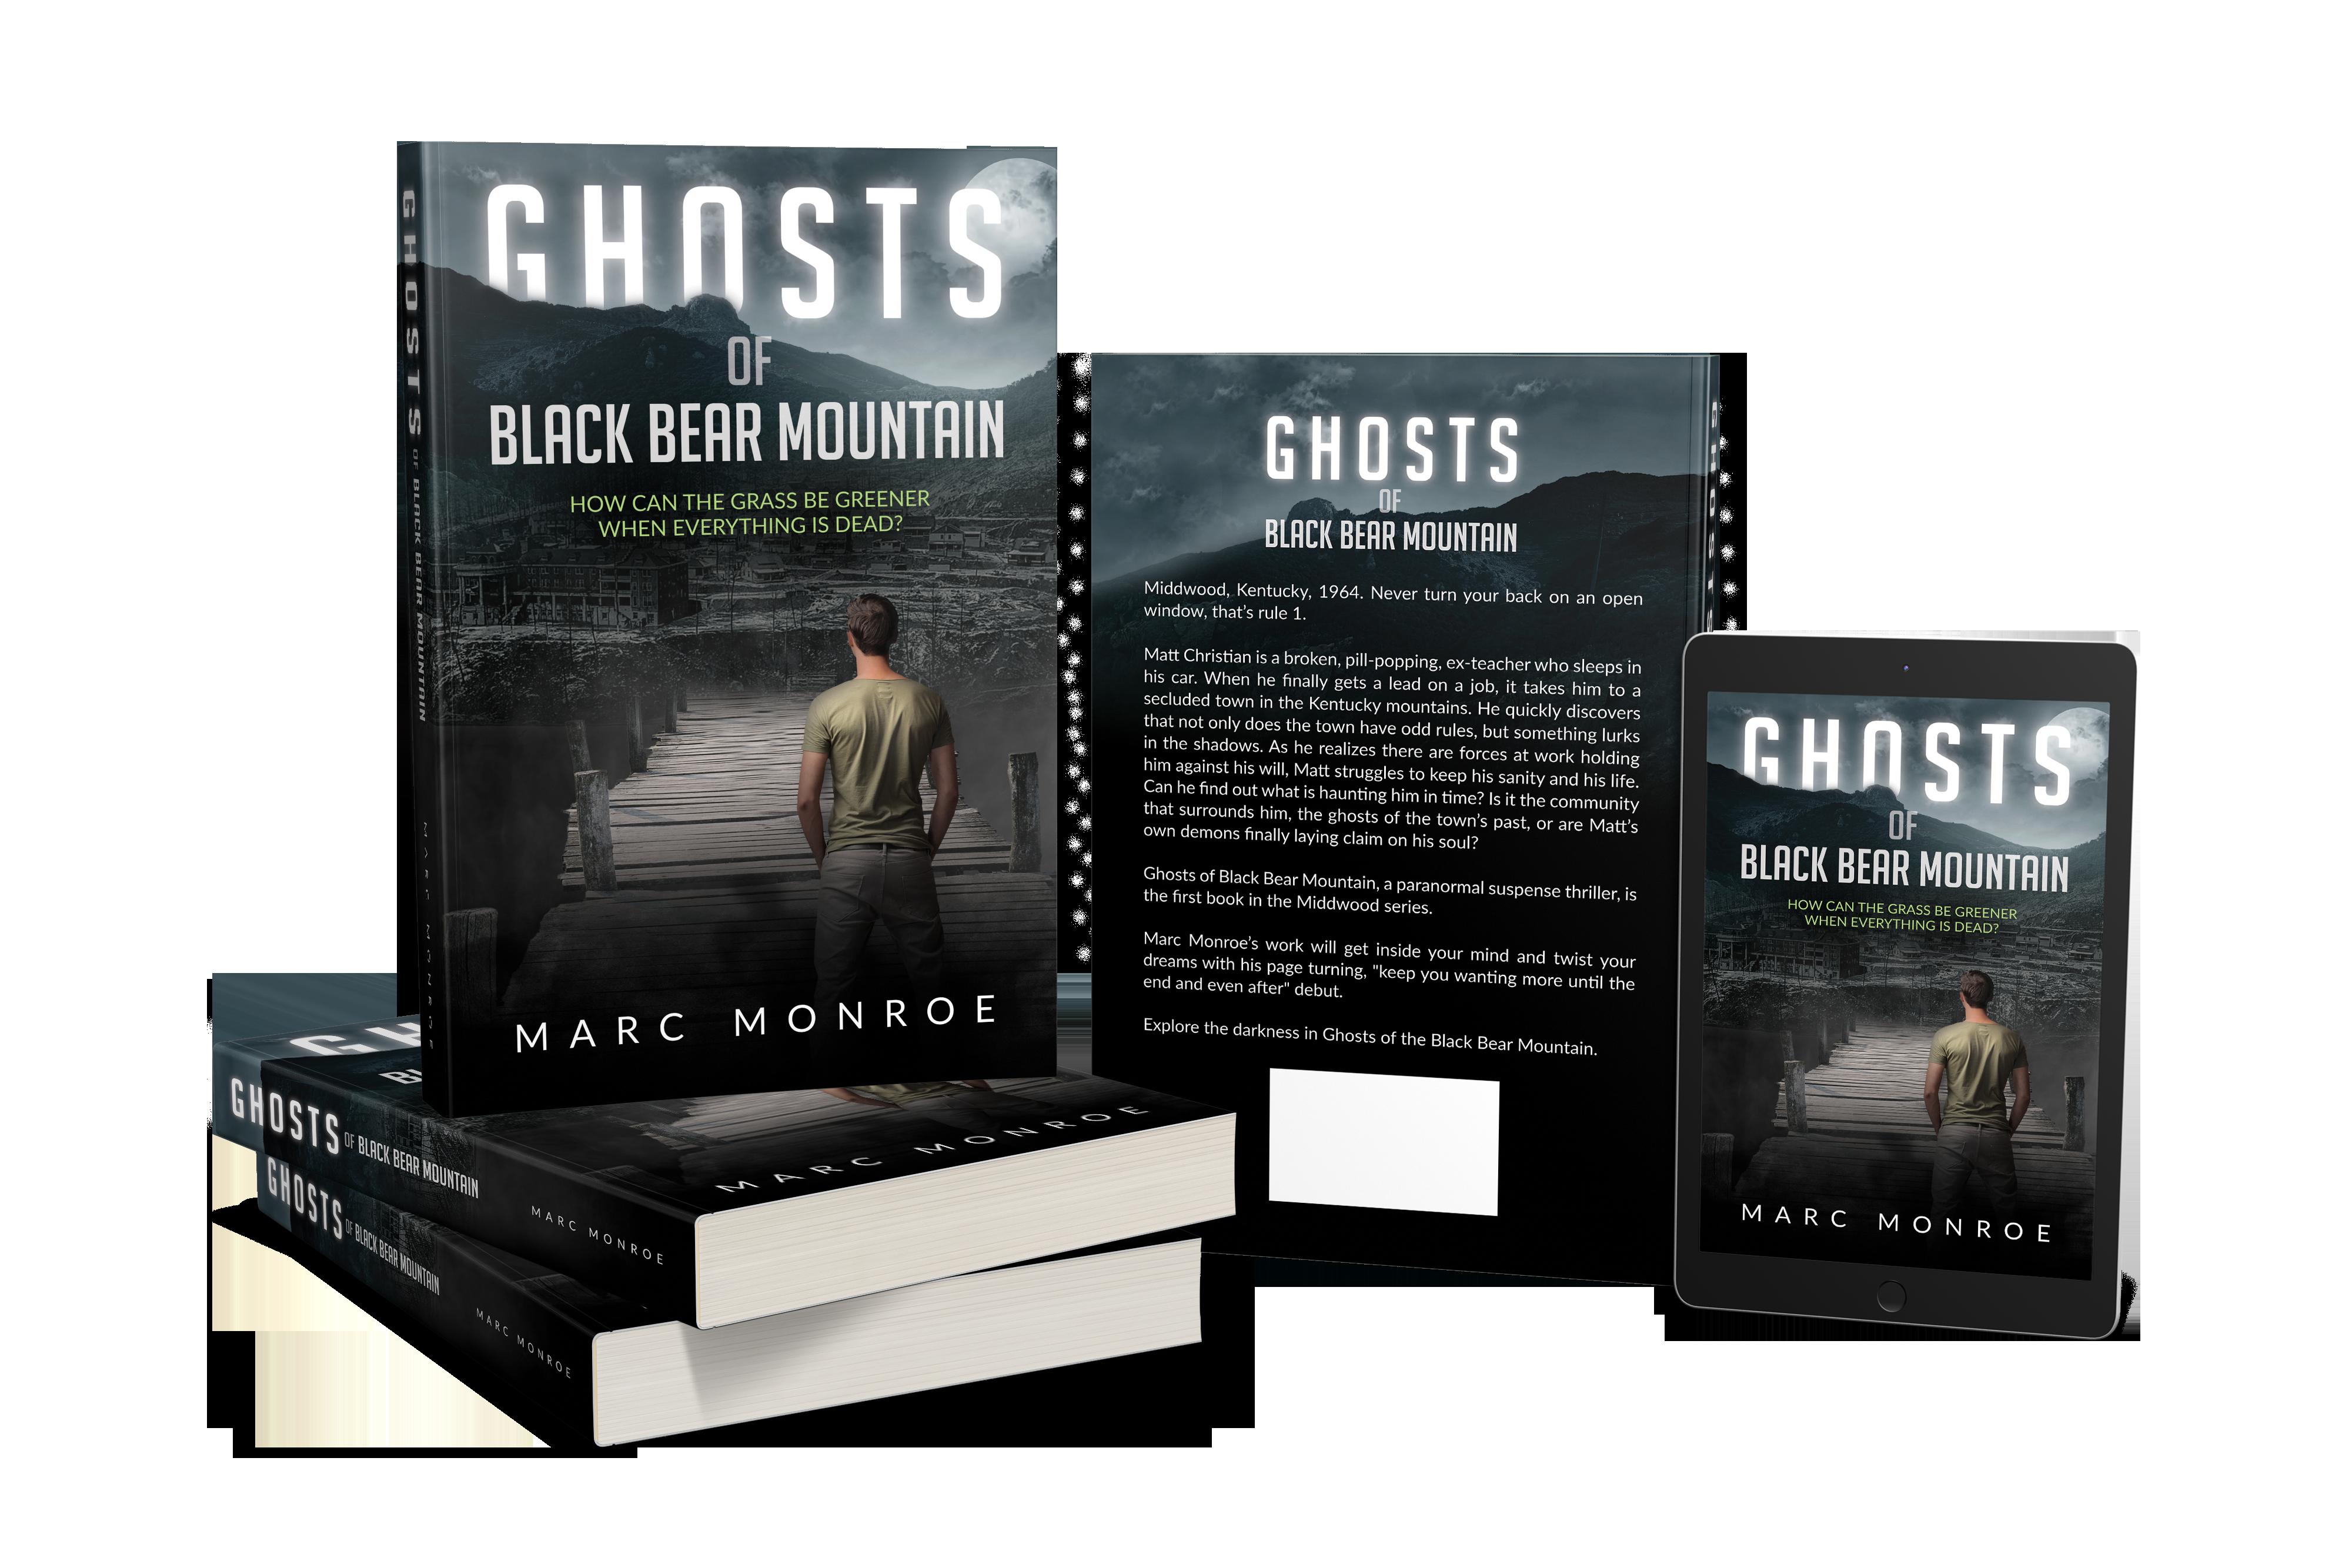 Ghosts of Black Bear Mountain